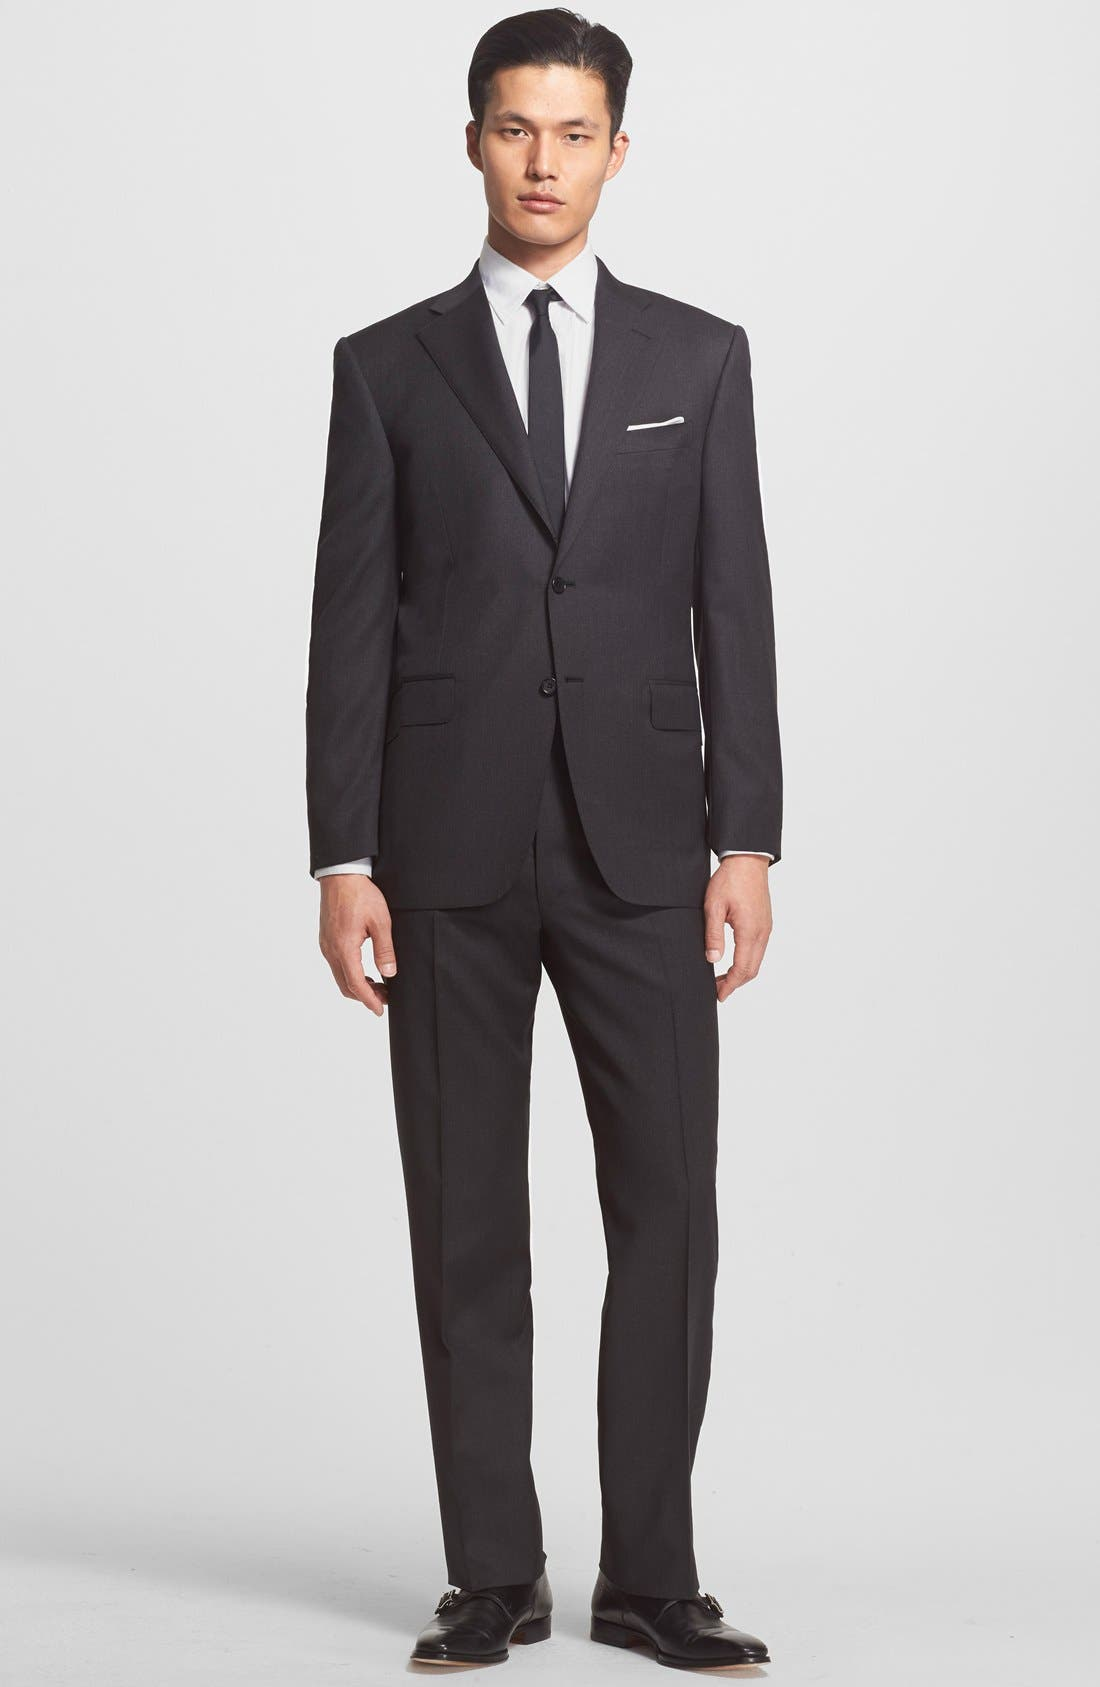 Main Image - Canali Trim Fit Wool Suit